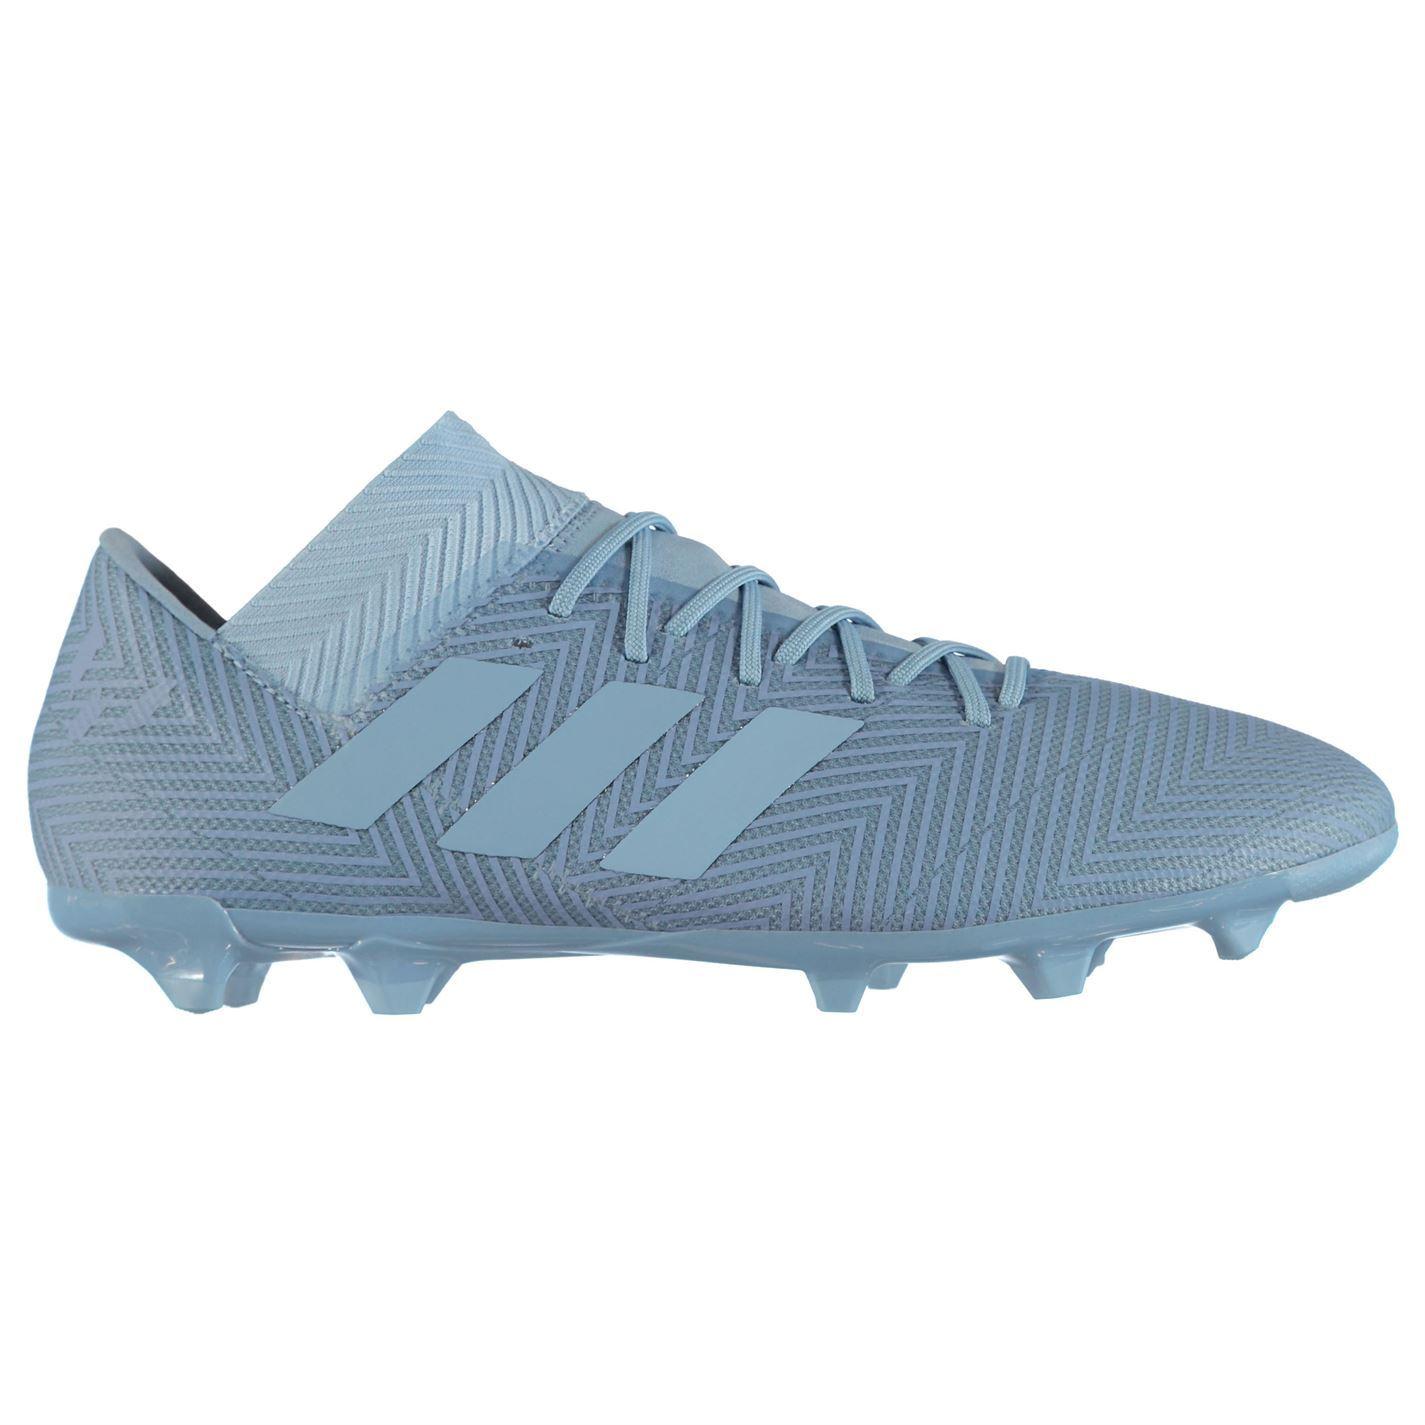 1d8e07d1fe2f4 adidas Nemeziz Messi 18.3 FG Firm Ground Football Boots Mens Soccer ...